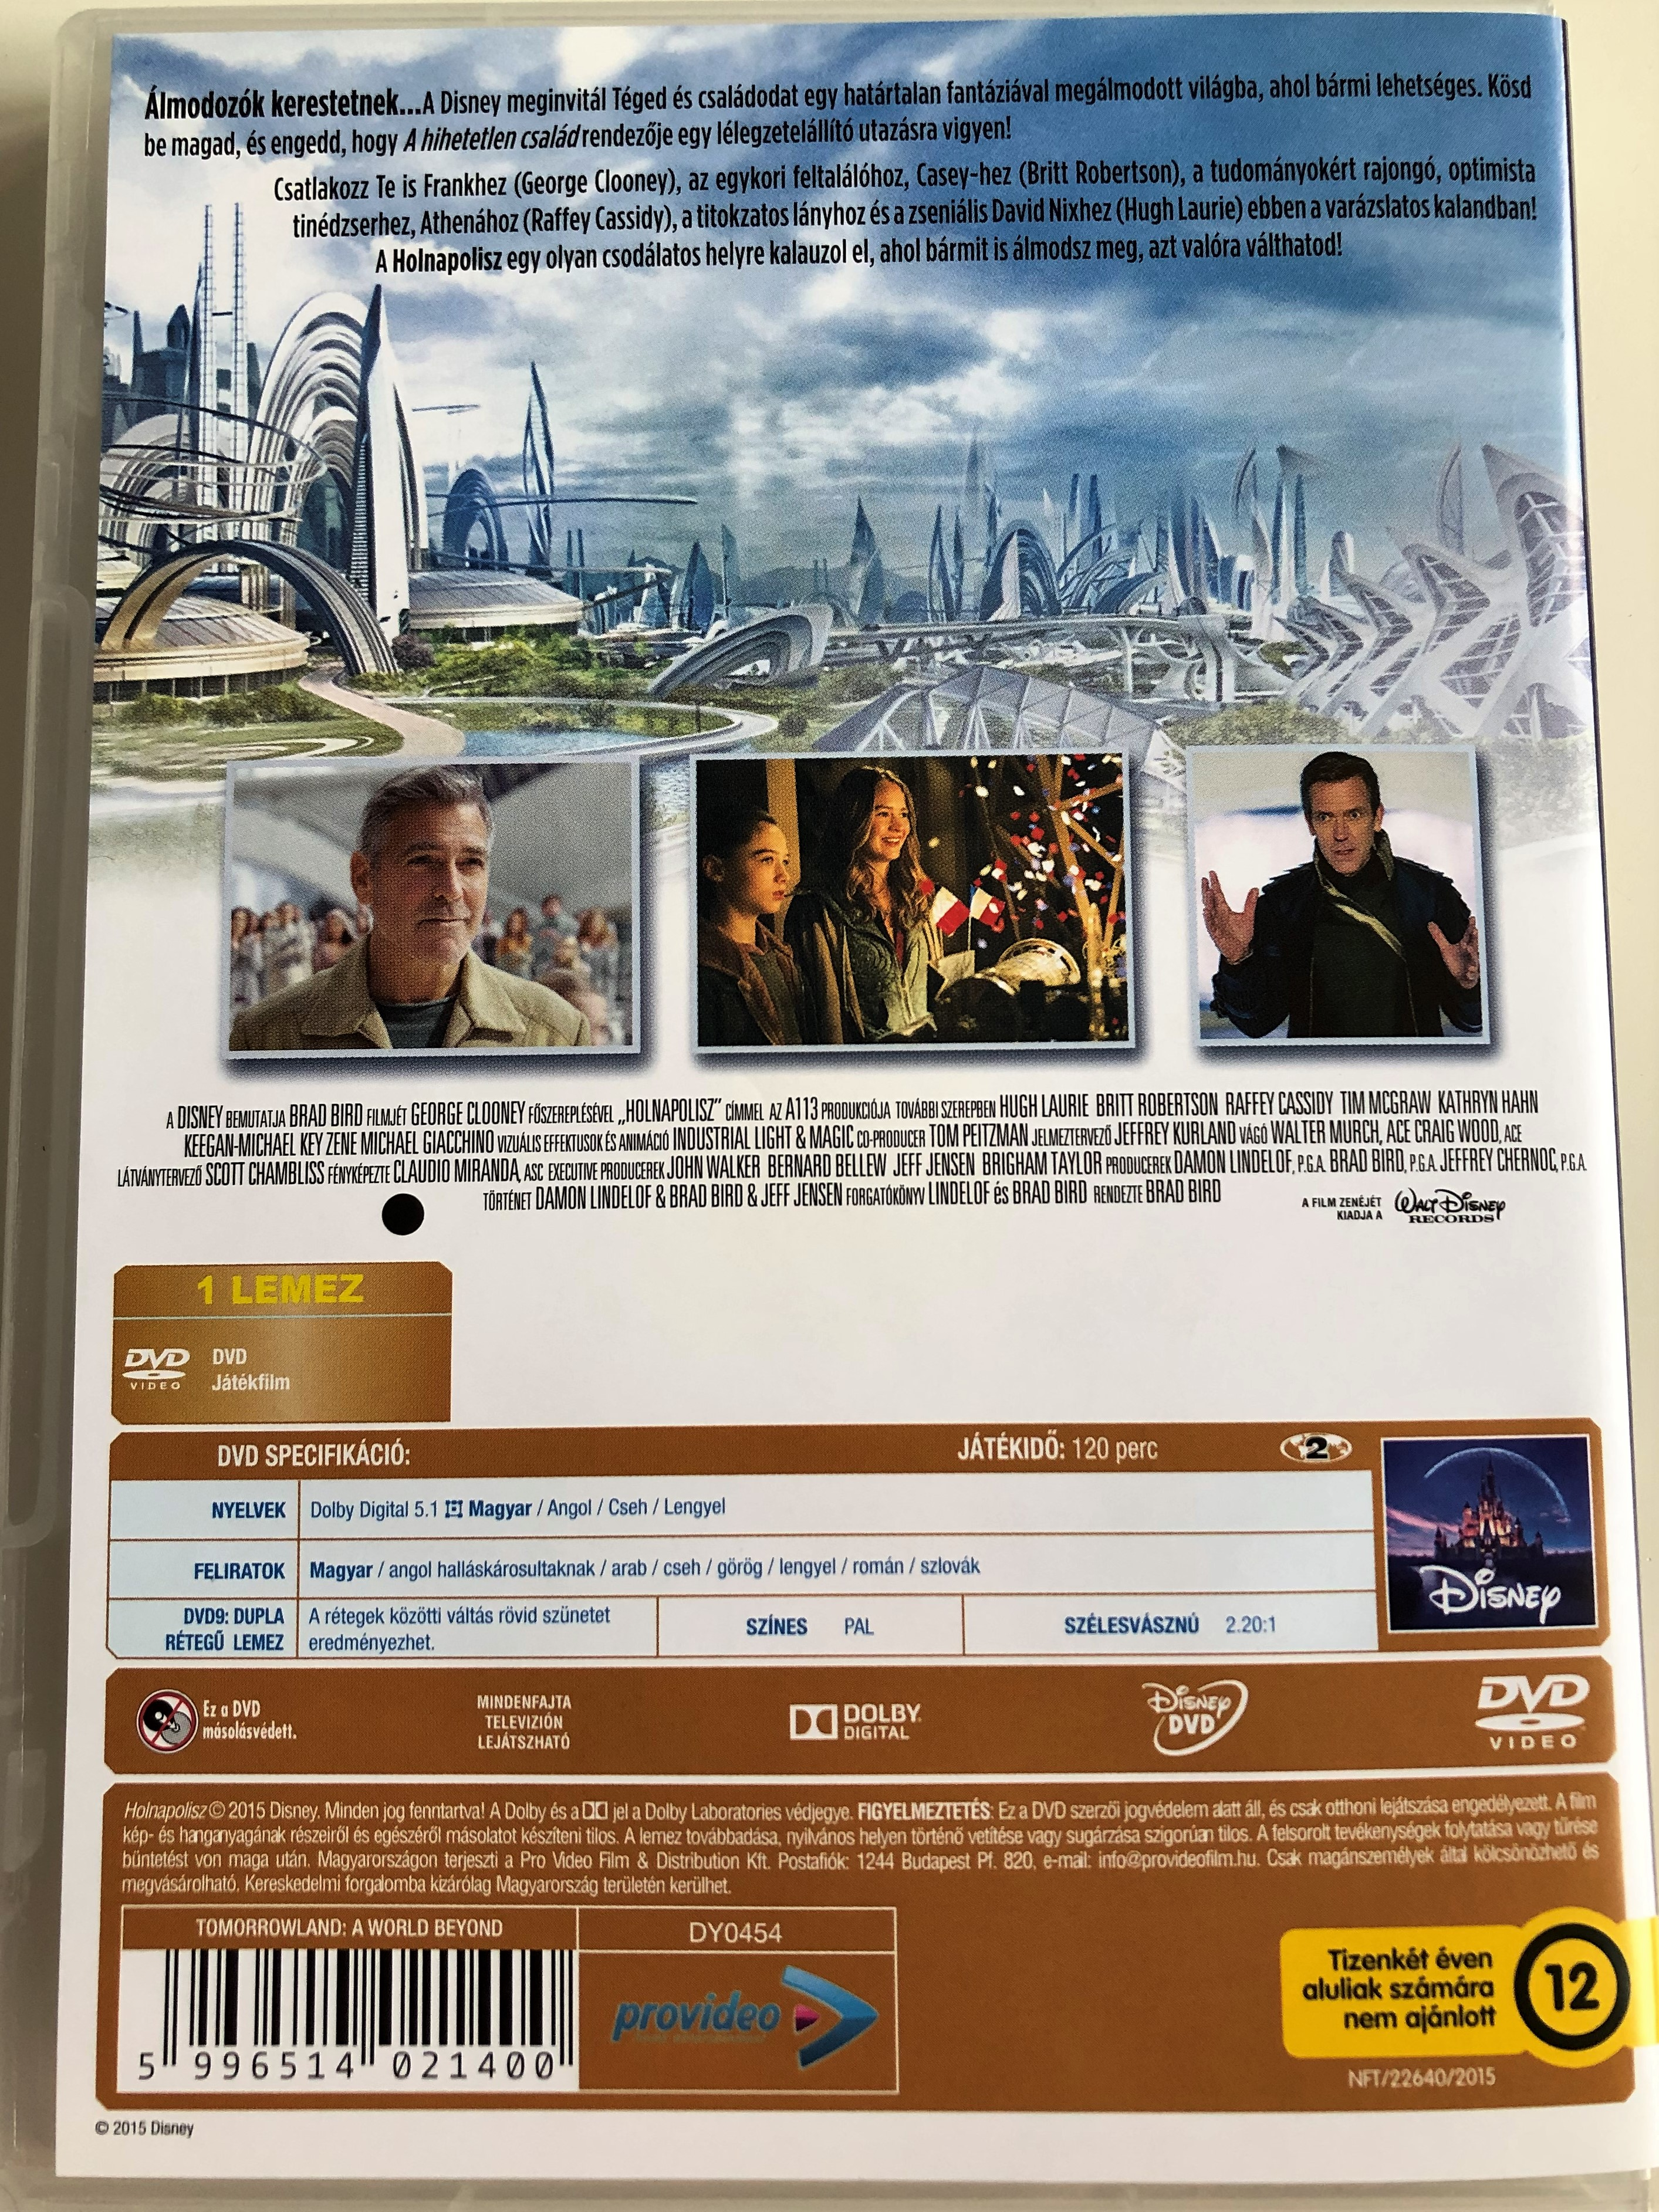 tomorrowland-dvd-2015-holnapolisz-directed-by-brad-bird-starring-george-clooney-hugh-laurie-britt-robertson-raffey-cassidy-tim-mcgraw-kathryn-hahn-keegan-michael-key-2-.jpg